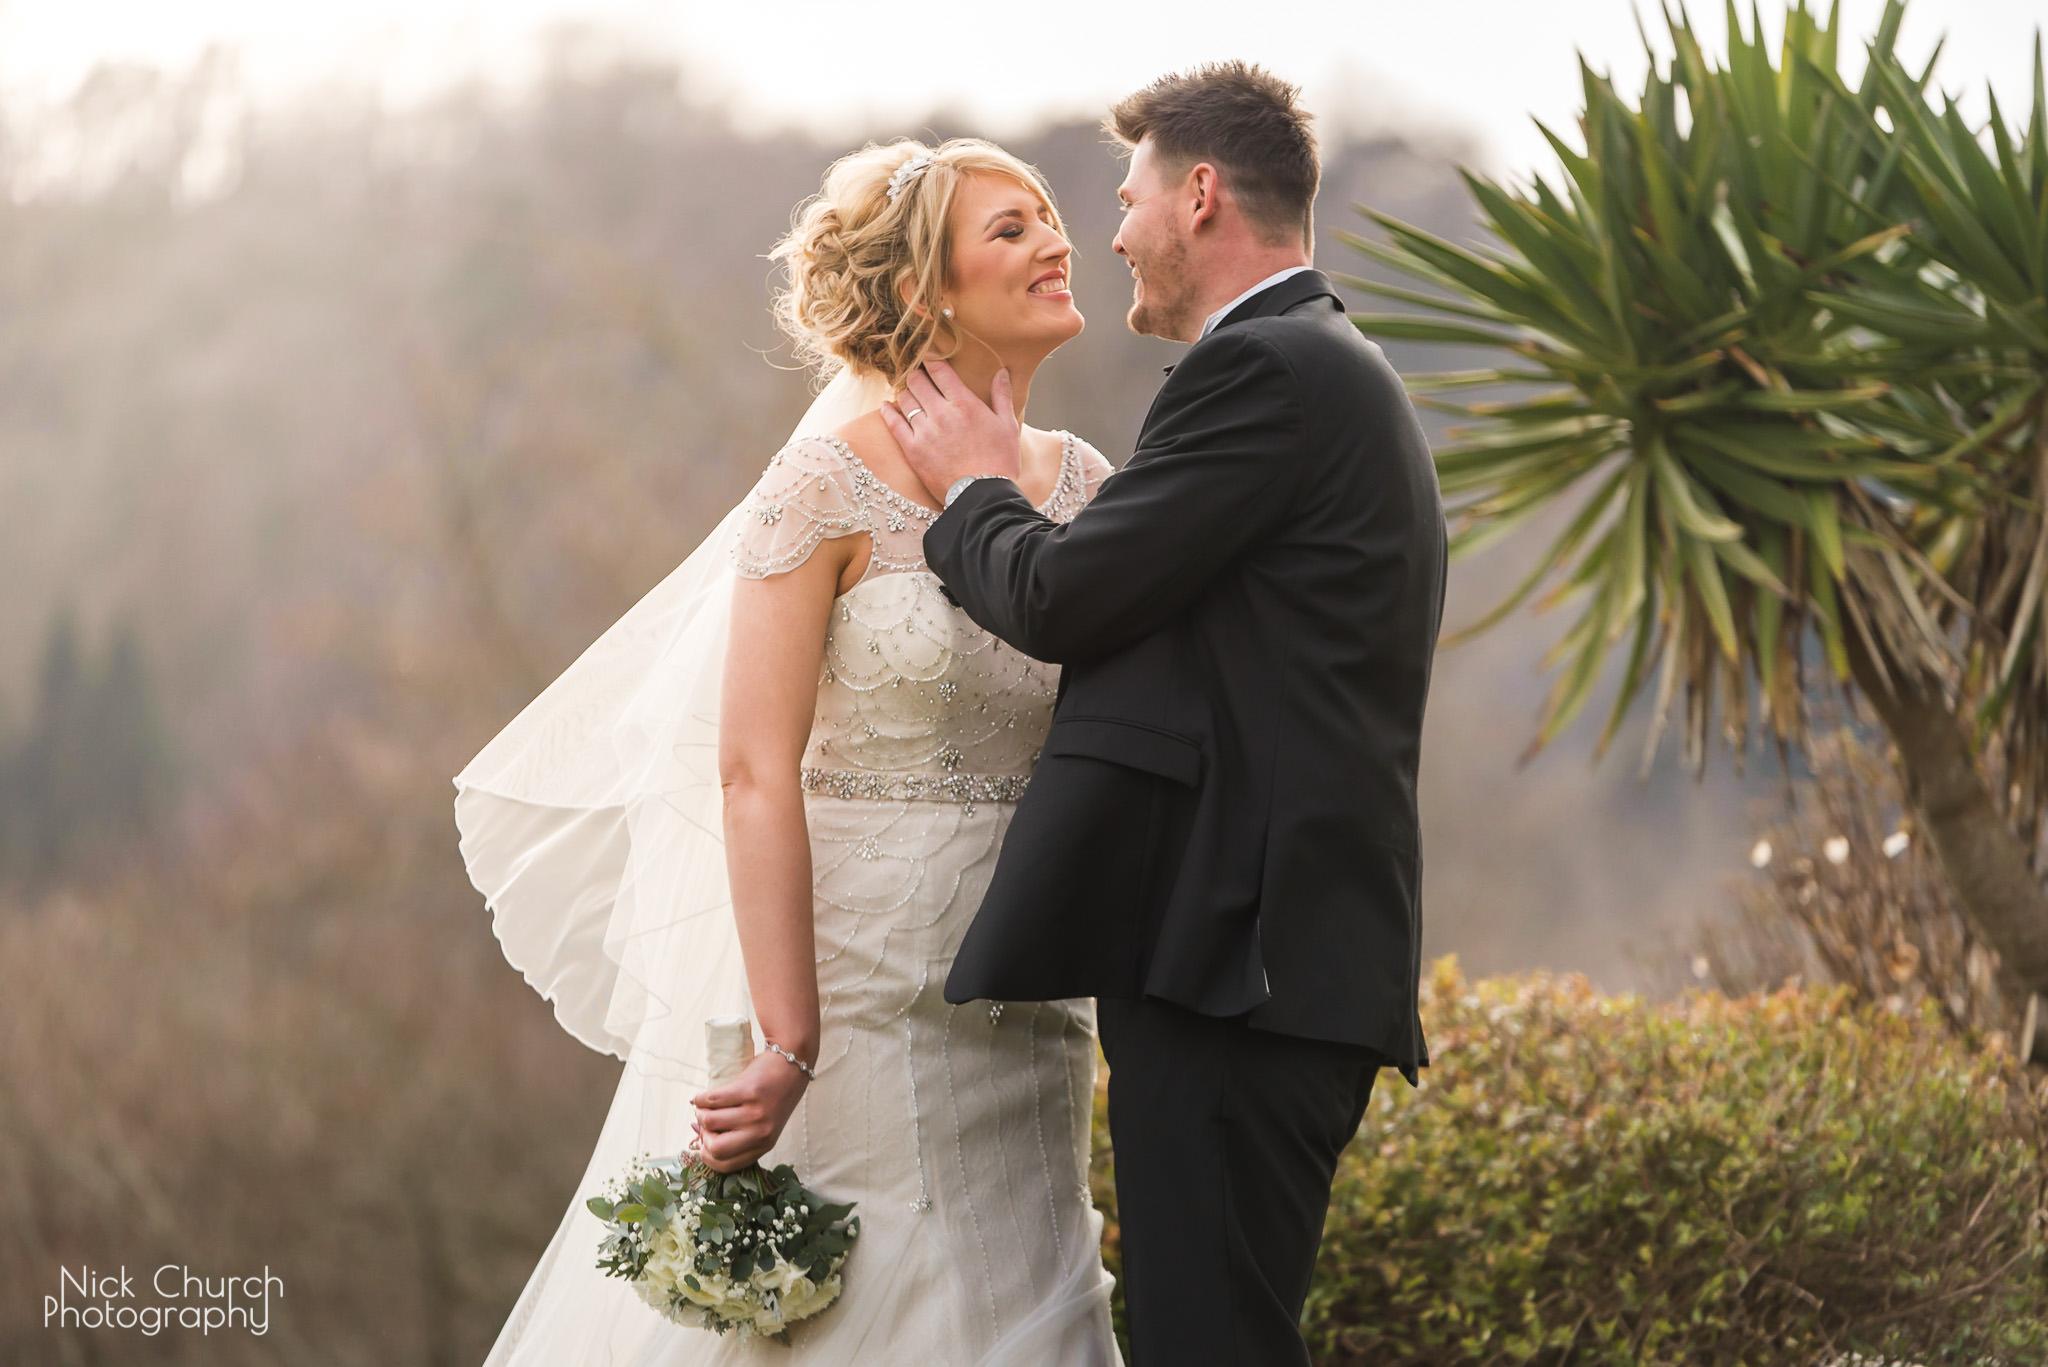 NC-20180317-stacy-and-mike-wedding-1208.jpg